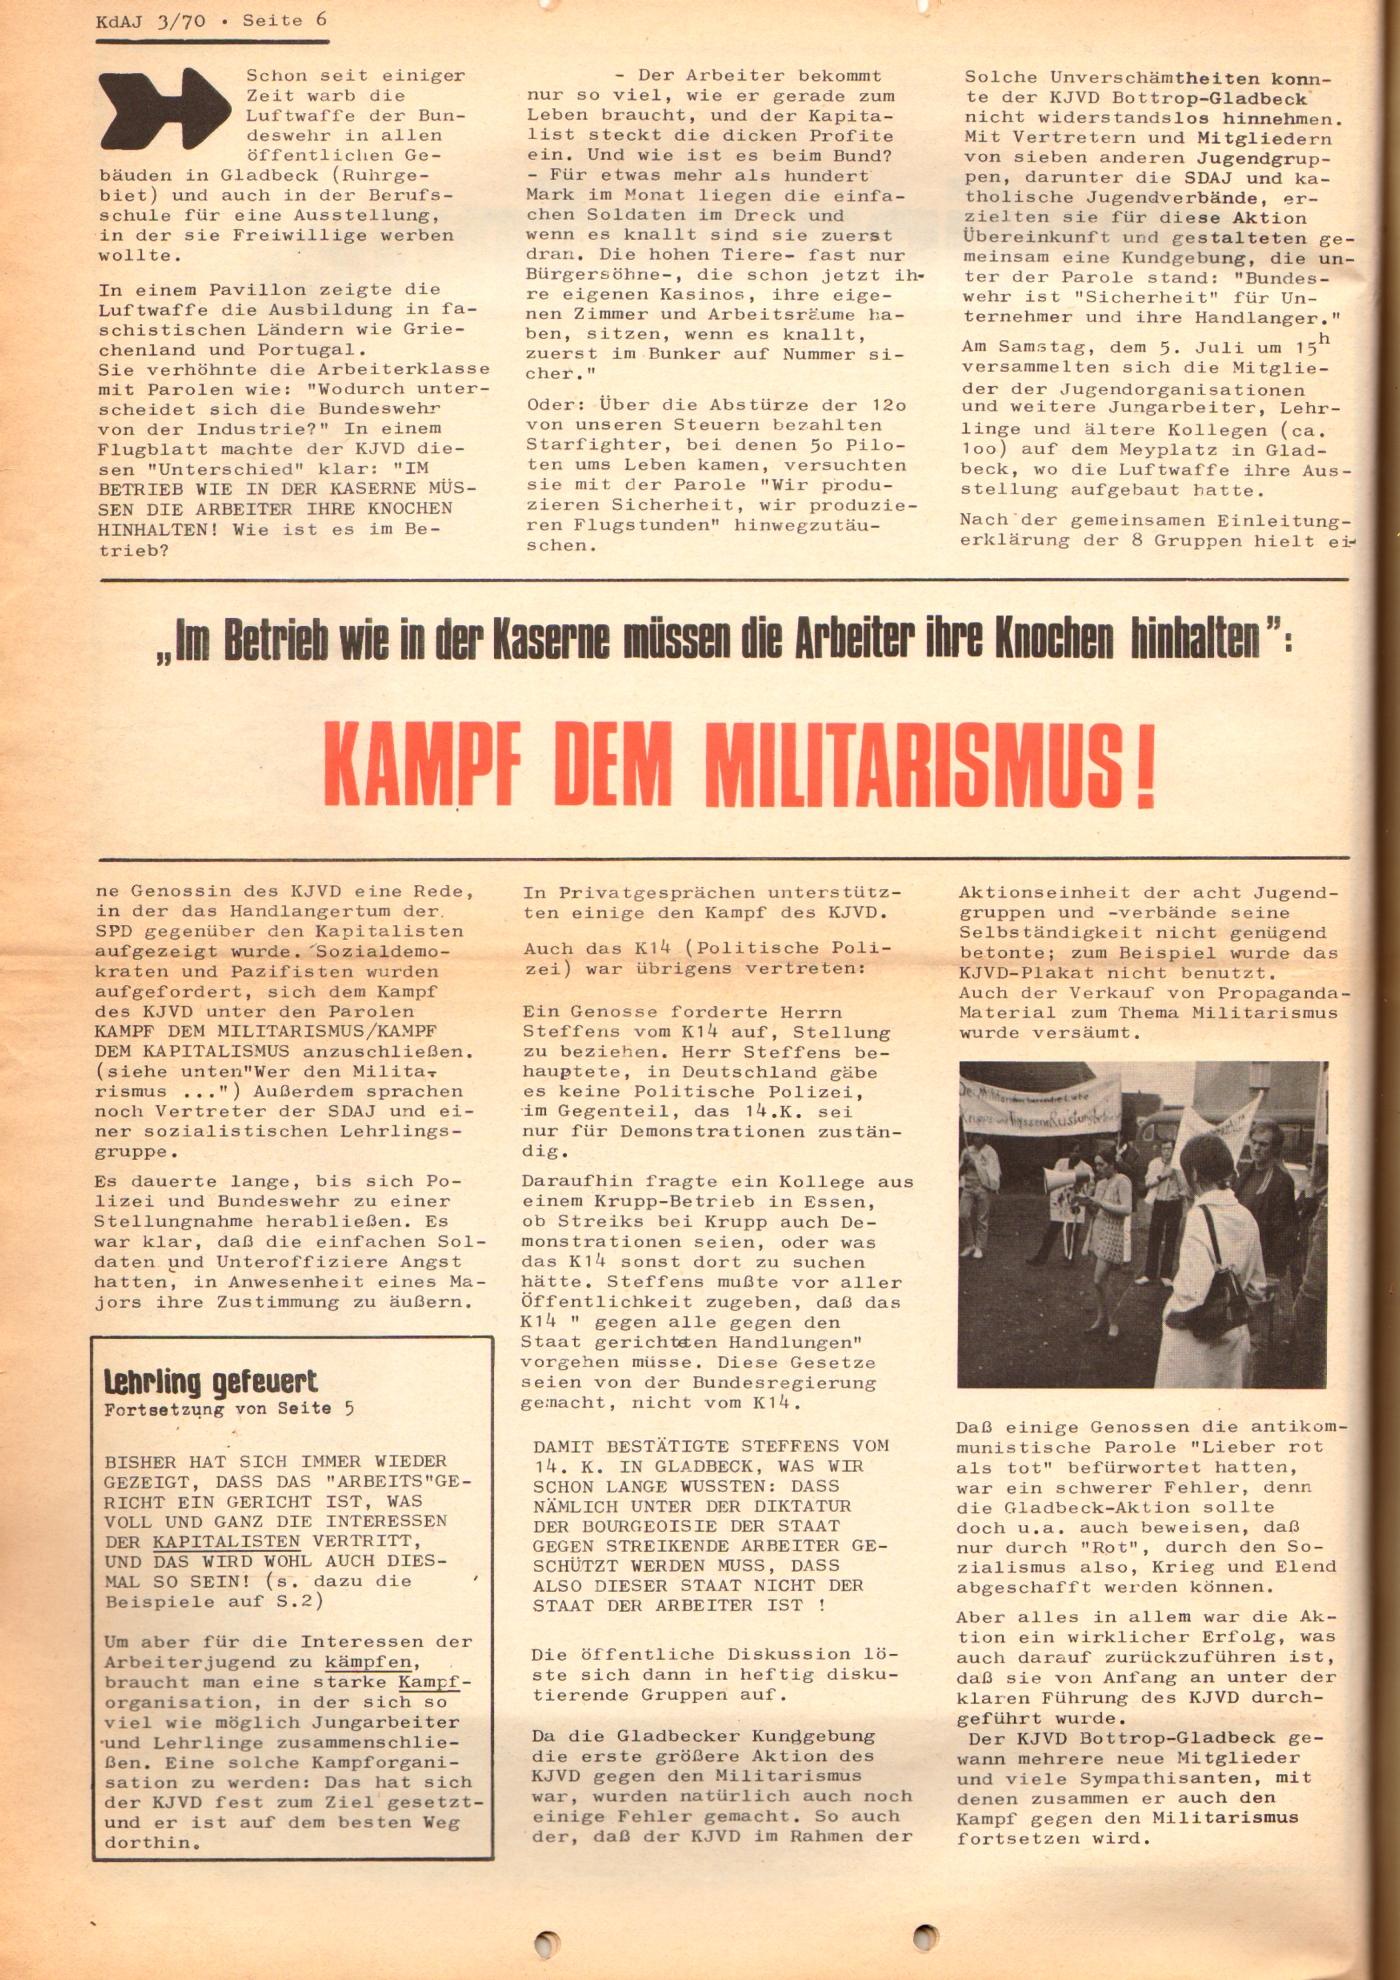 KDAJ, 1. Jg., August 1970, Nr. 3, Seite 6